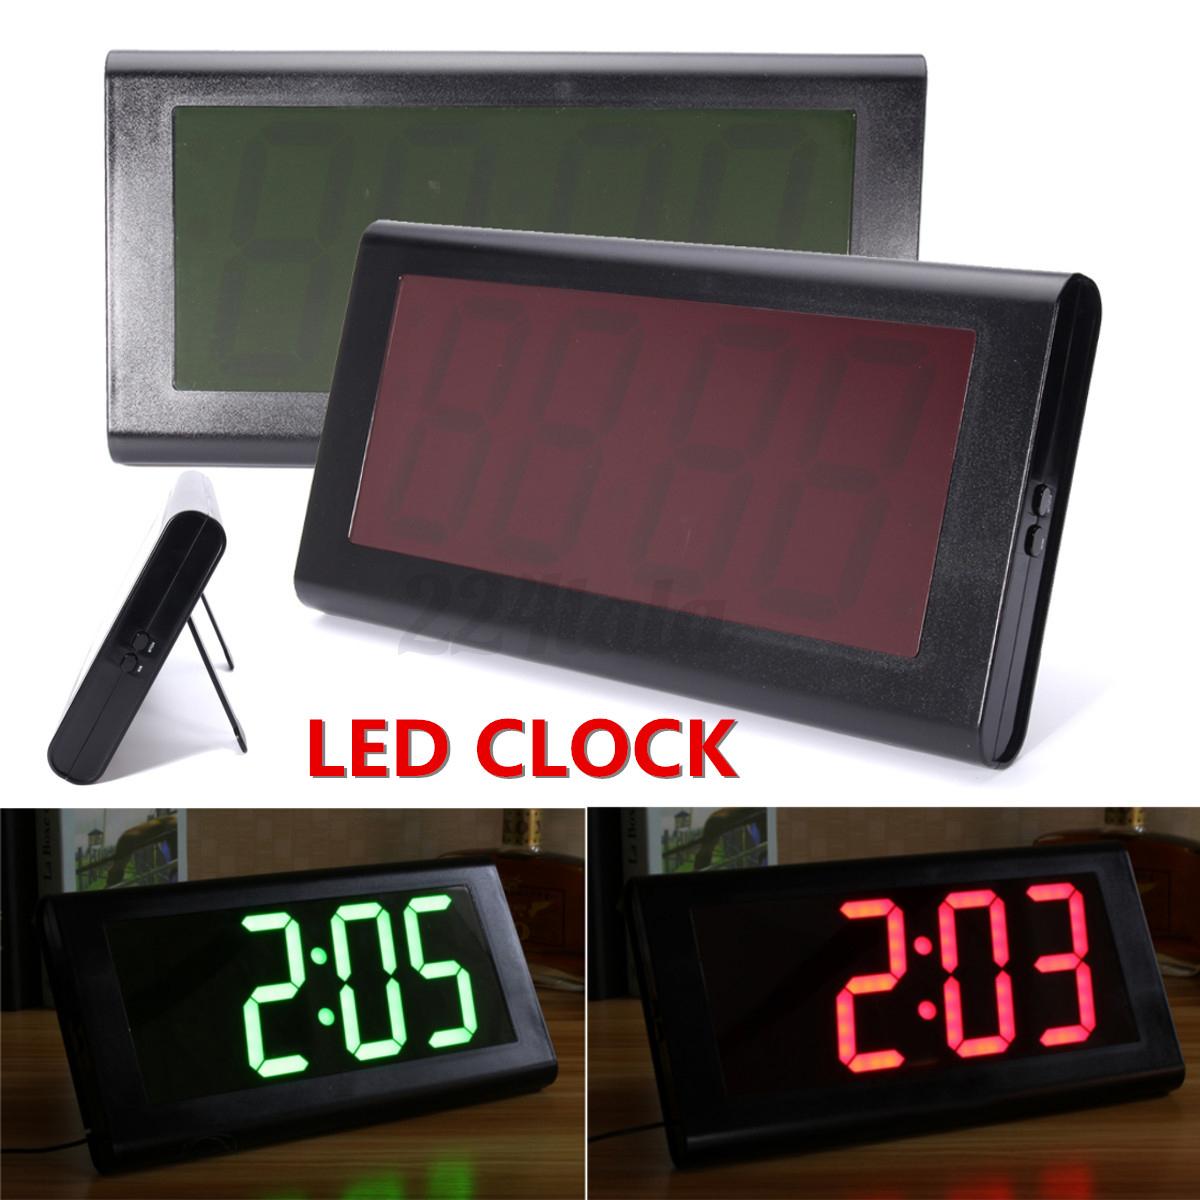 3d Modern Digital Large Led Light Desk Wall Clock Display Watch Home Decoration